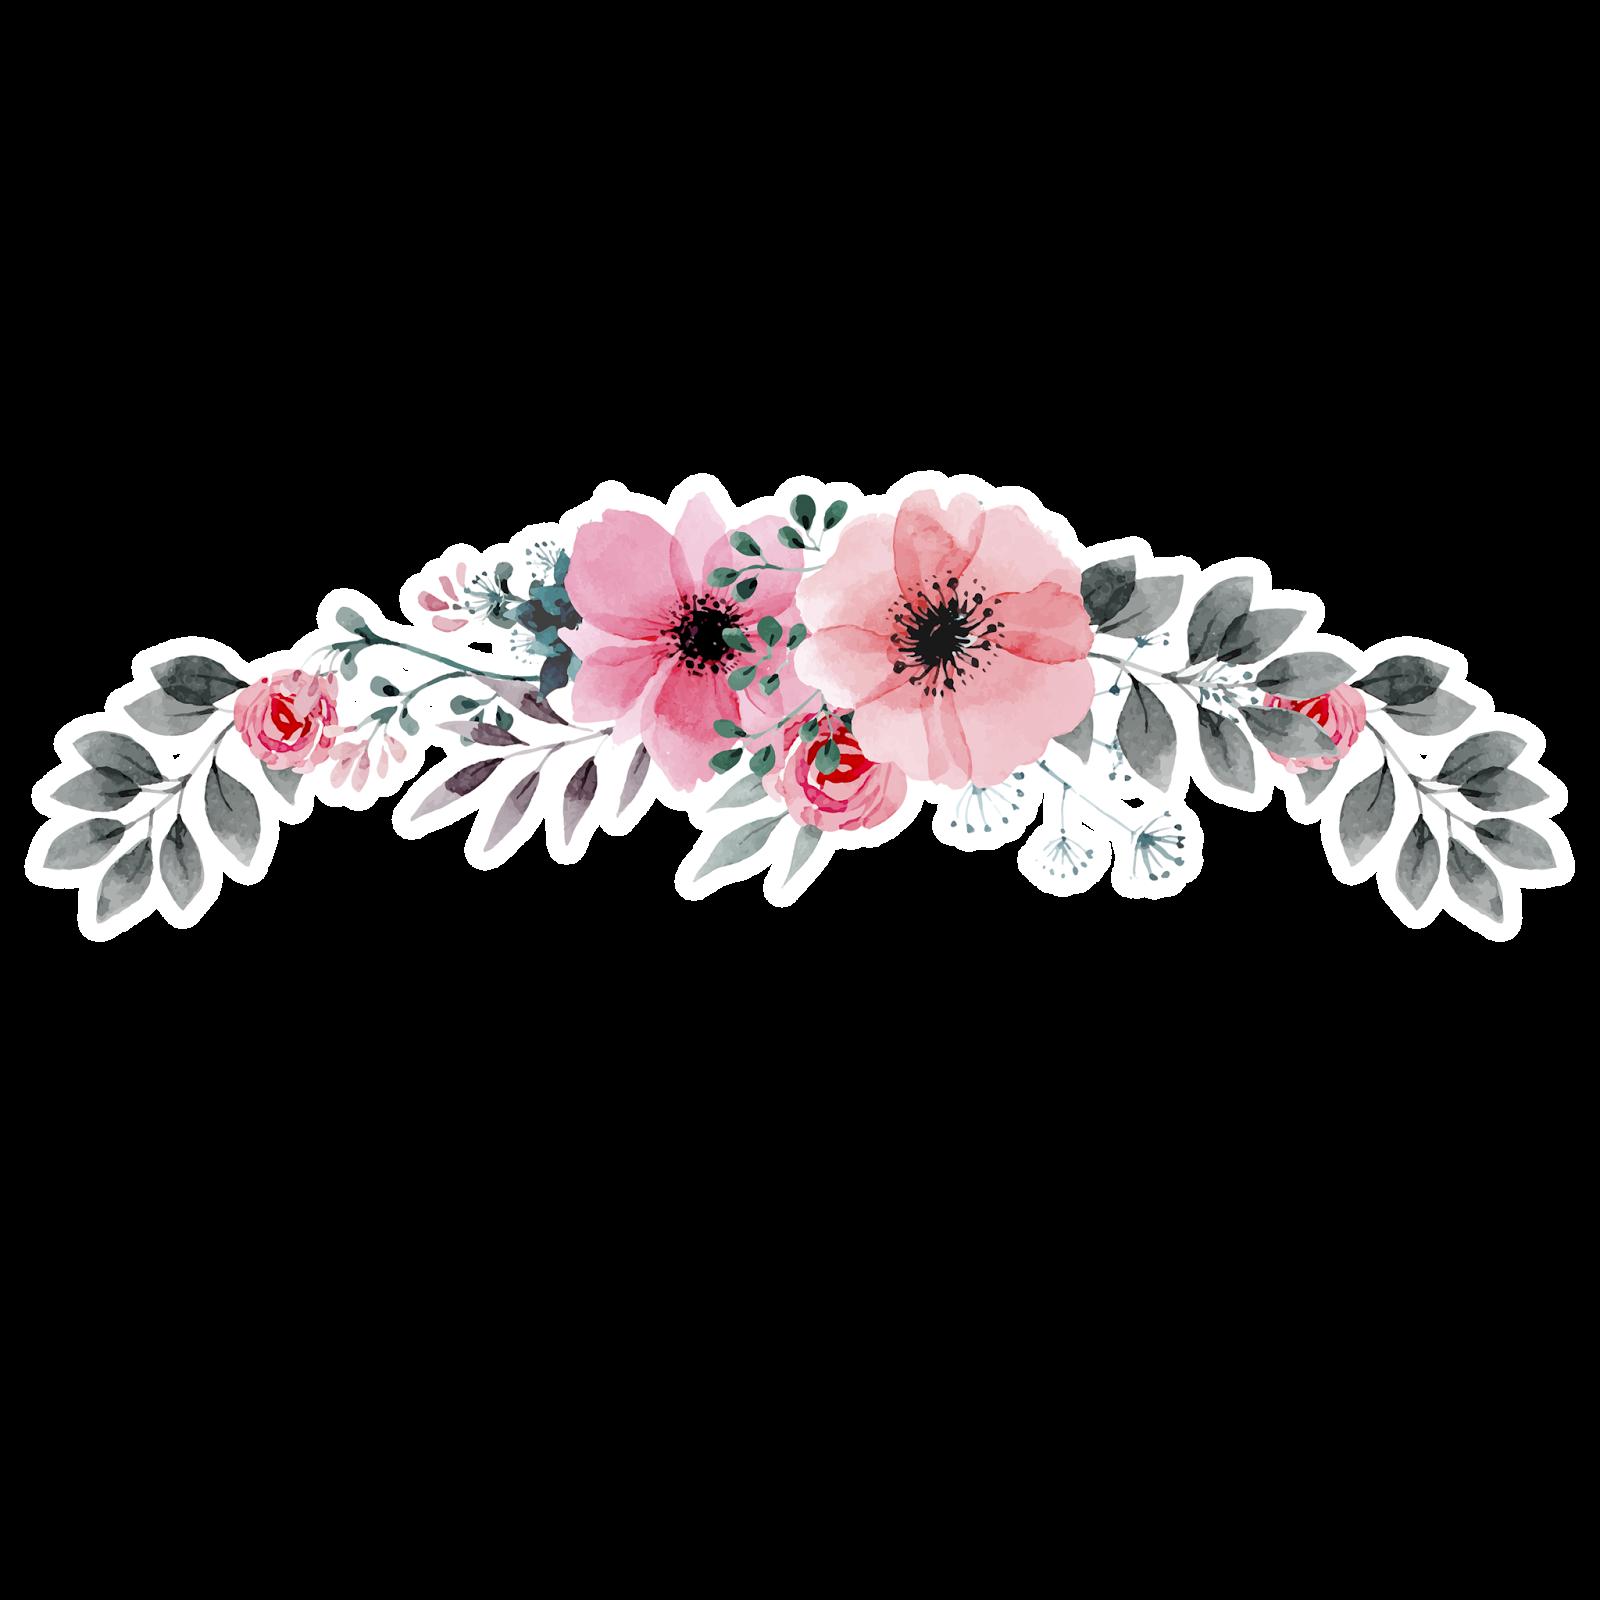 Millions Of Png Images Backgrounds And Vectors For Free Download Pngtree Flores Pintadas Flores Acuarela Flores De Colores